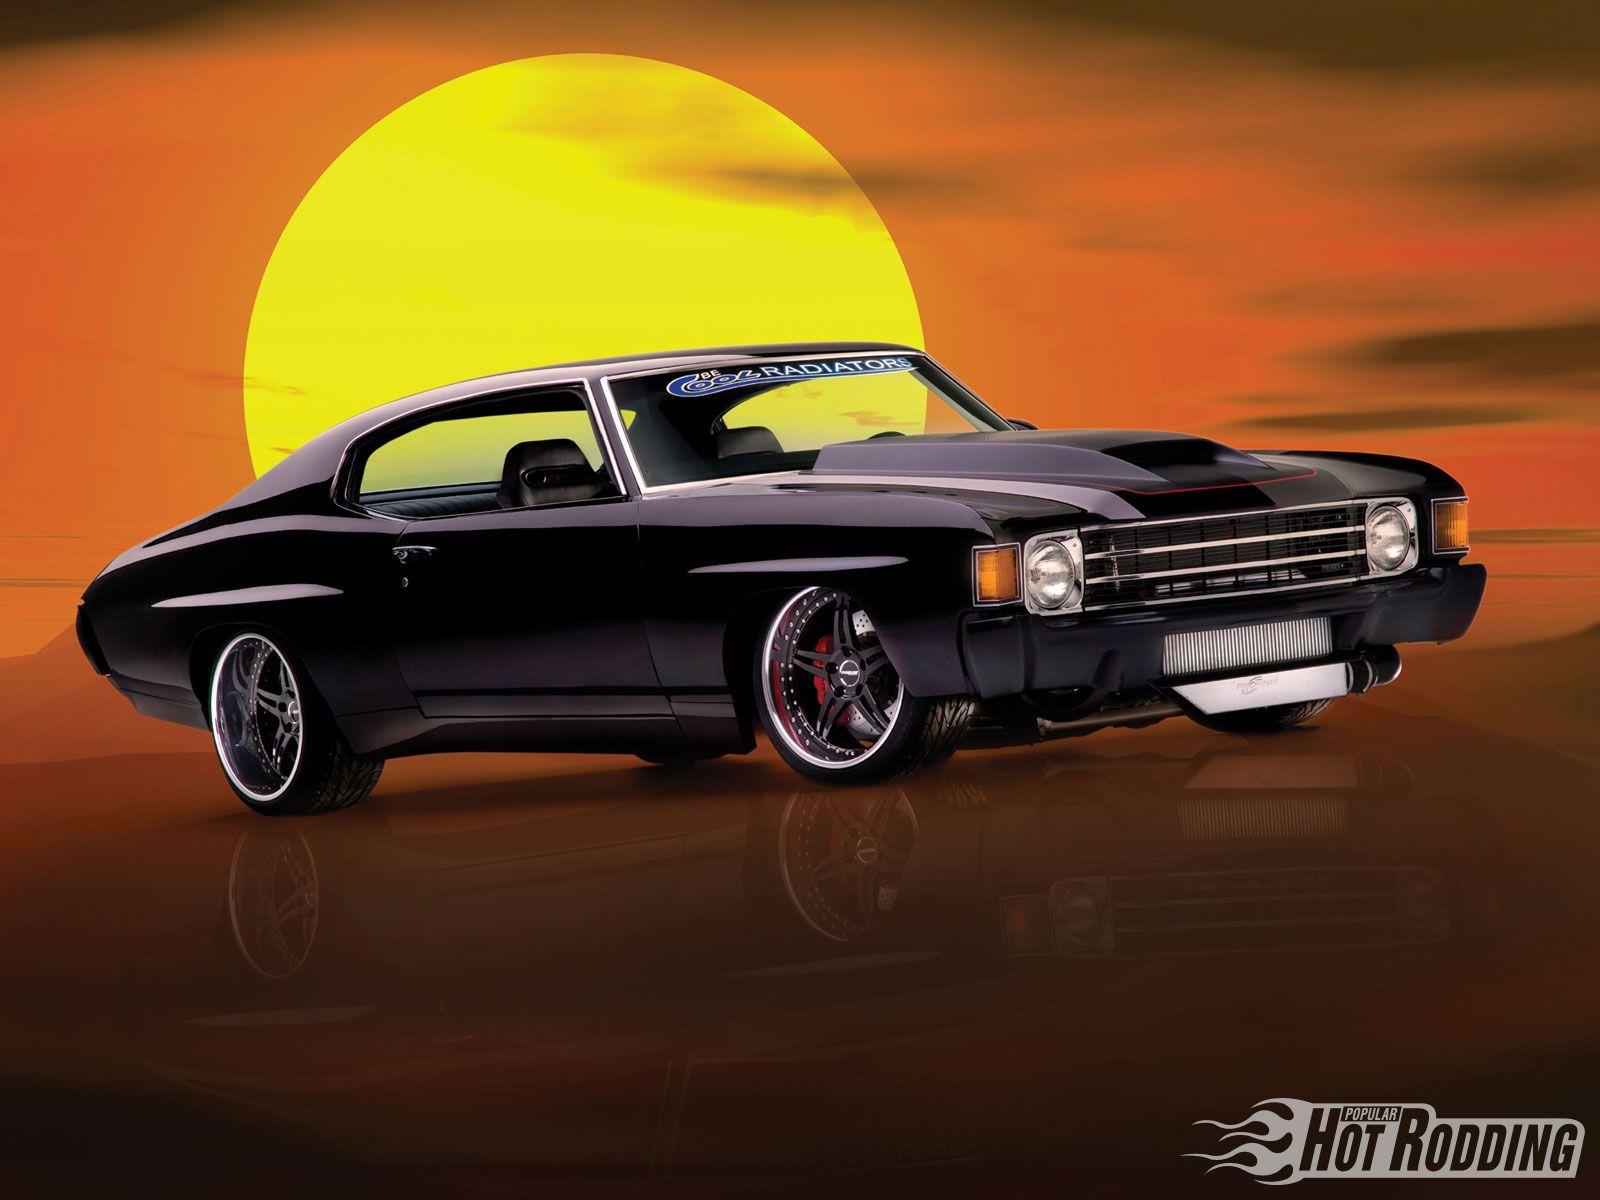 72 Chevelle Chevy Chevelle Chevelle Chevy Muscle Cars